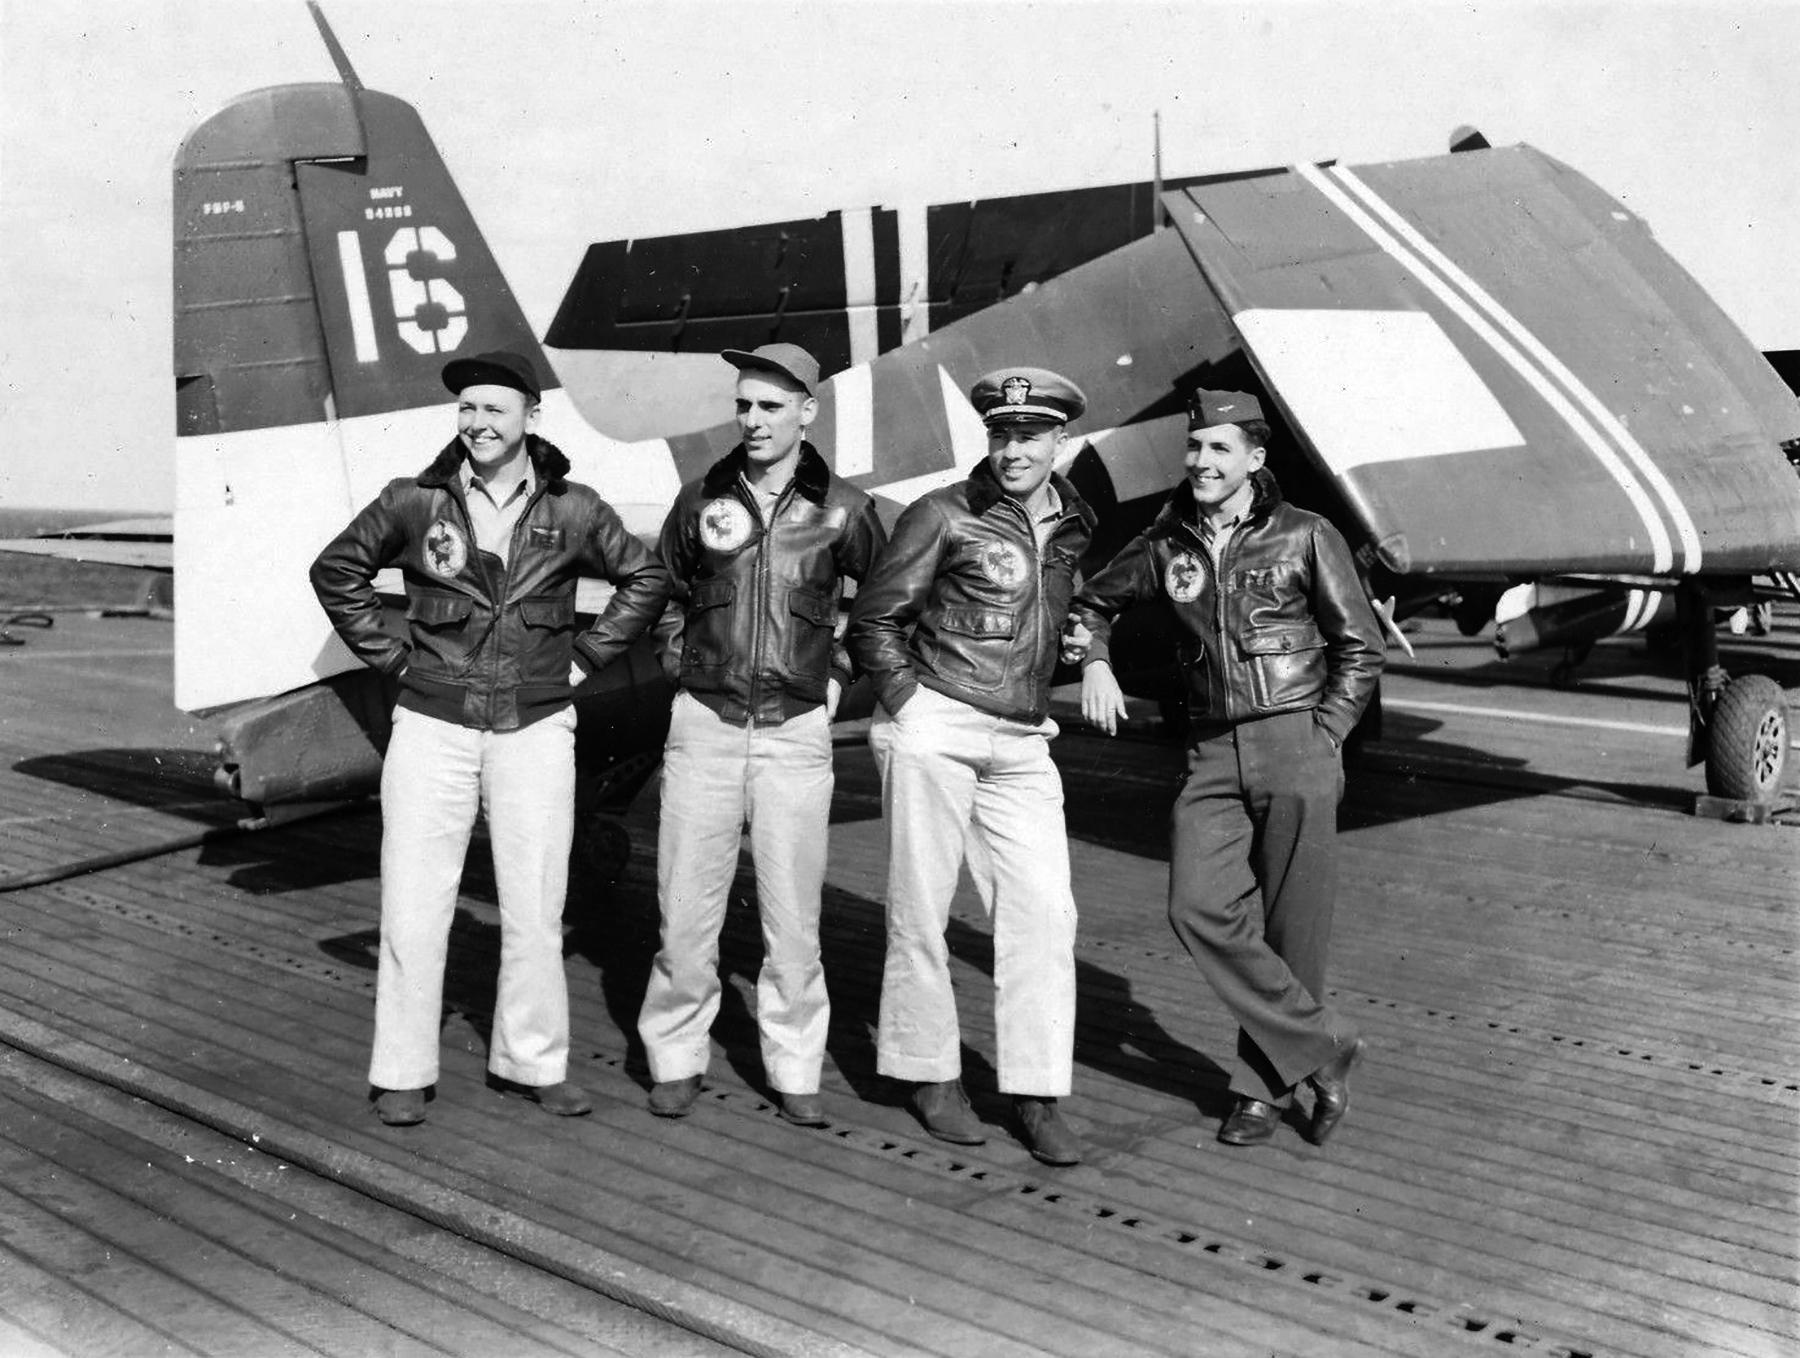 Grumman F6F 5 Hellcat VF 36 White 16 CVE 112 USS Siboney Aug 1945 May 1946 01